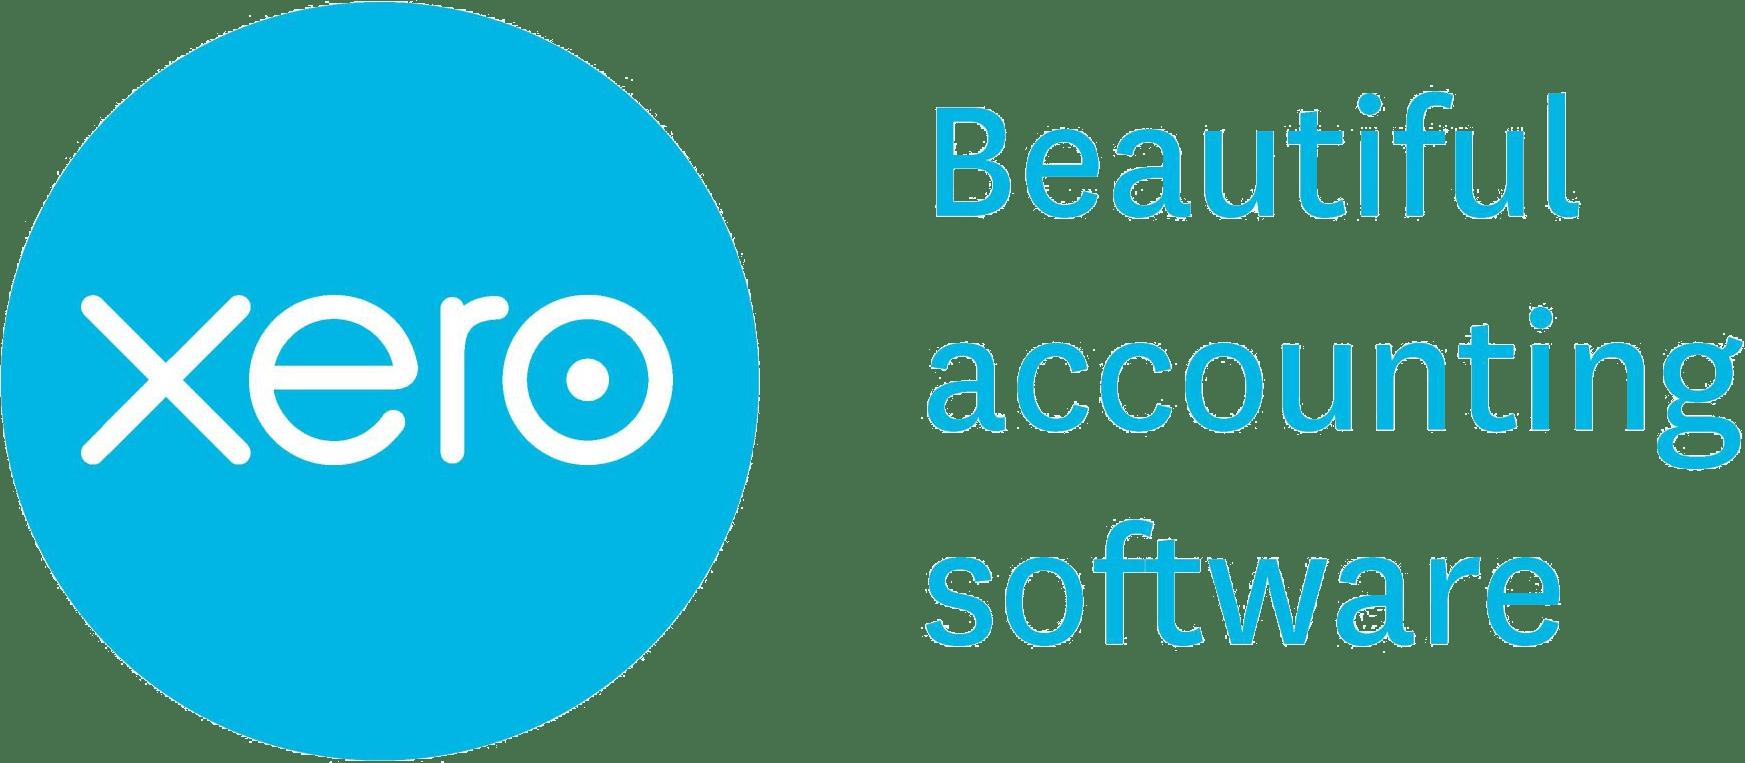 Xero logo clipart graphic free library Xero - Logo 2 (comp) - Tantum Benefits graphic free library